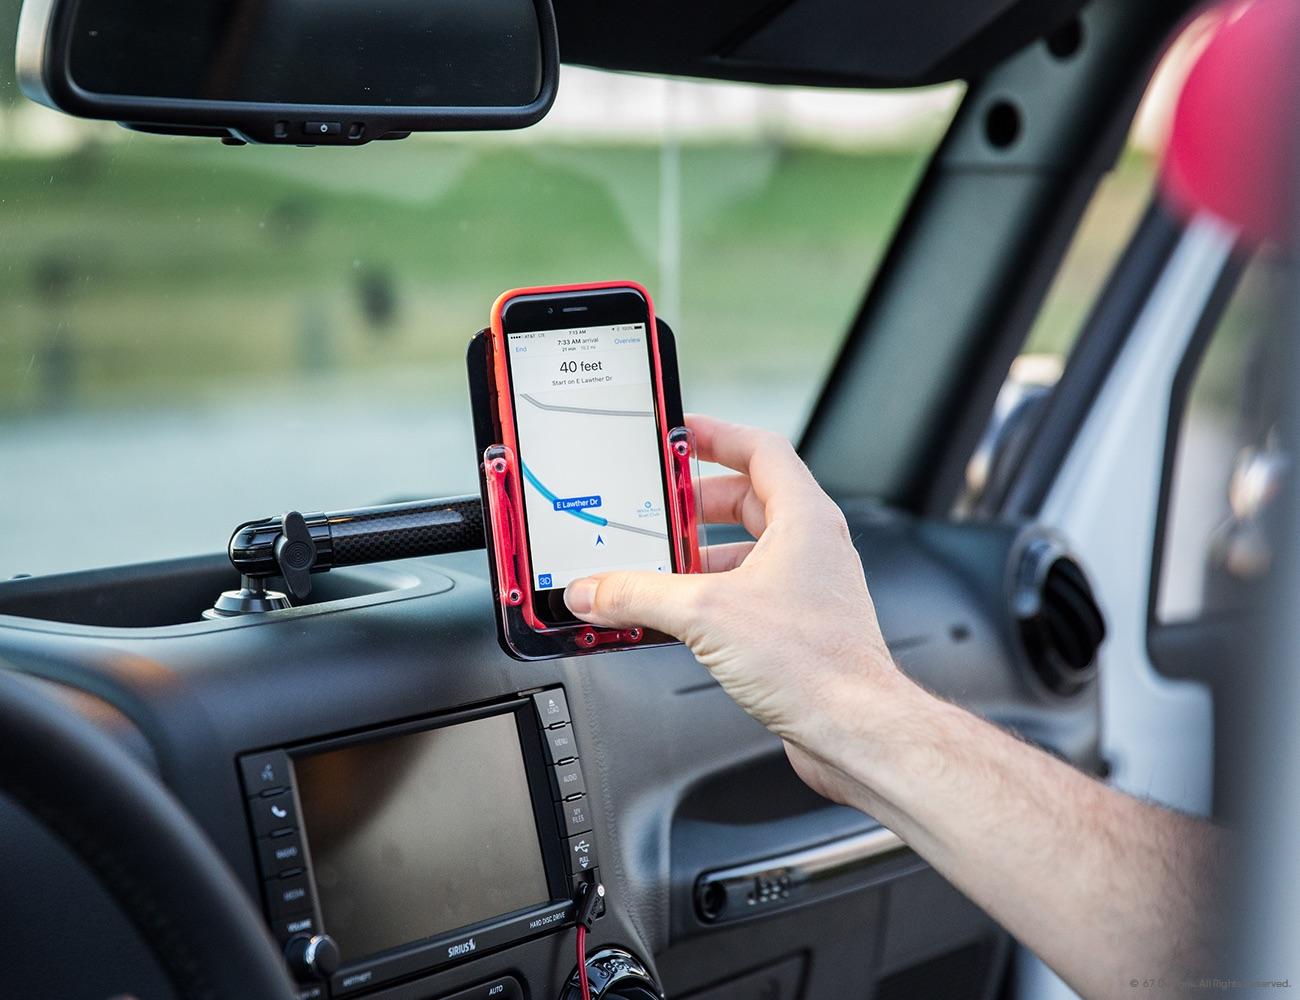 (CF) Carbon Fiber Series – Jeep JK Mount for iPhone 6/6S